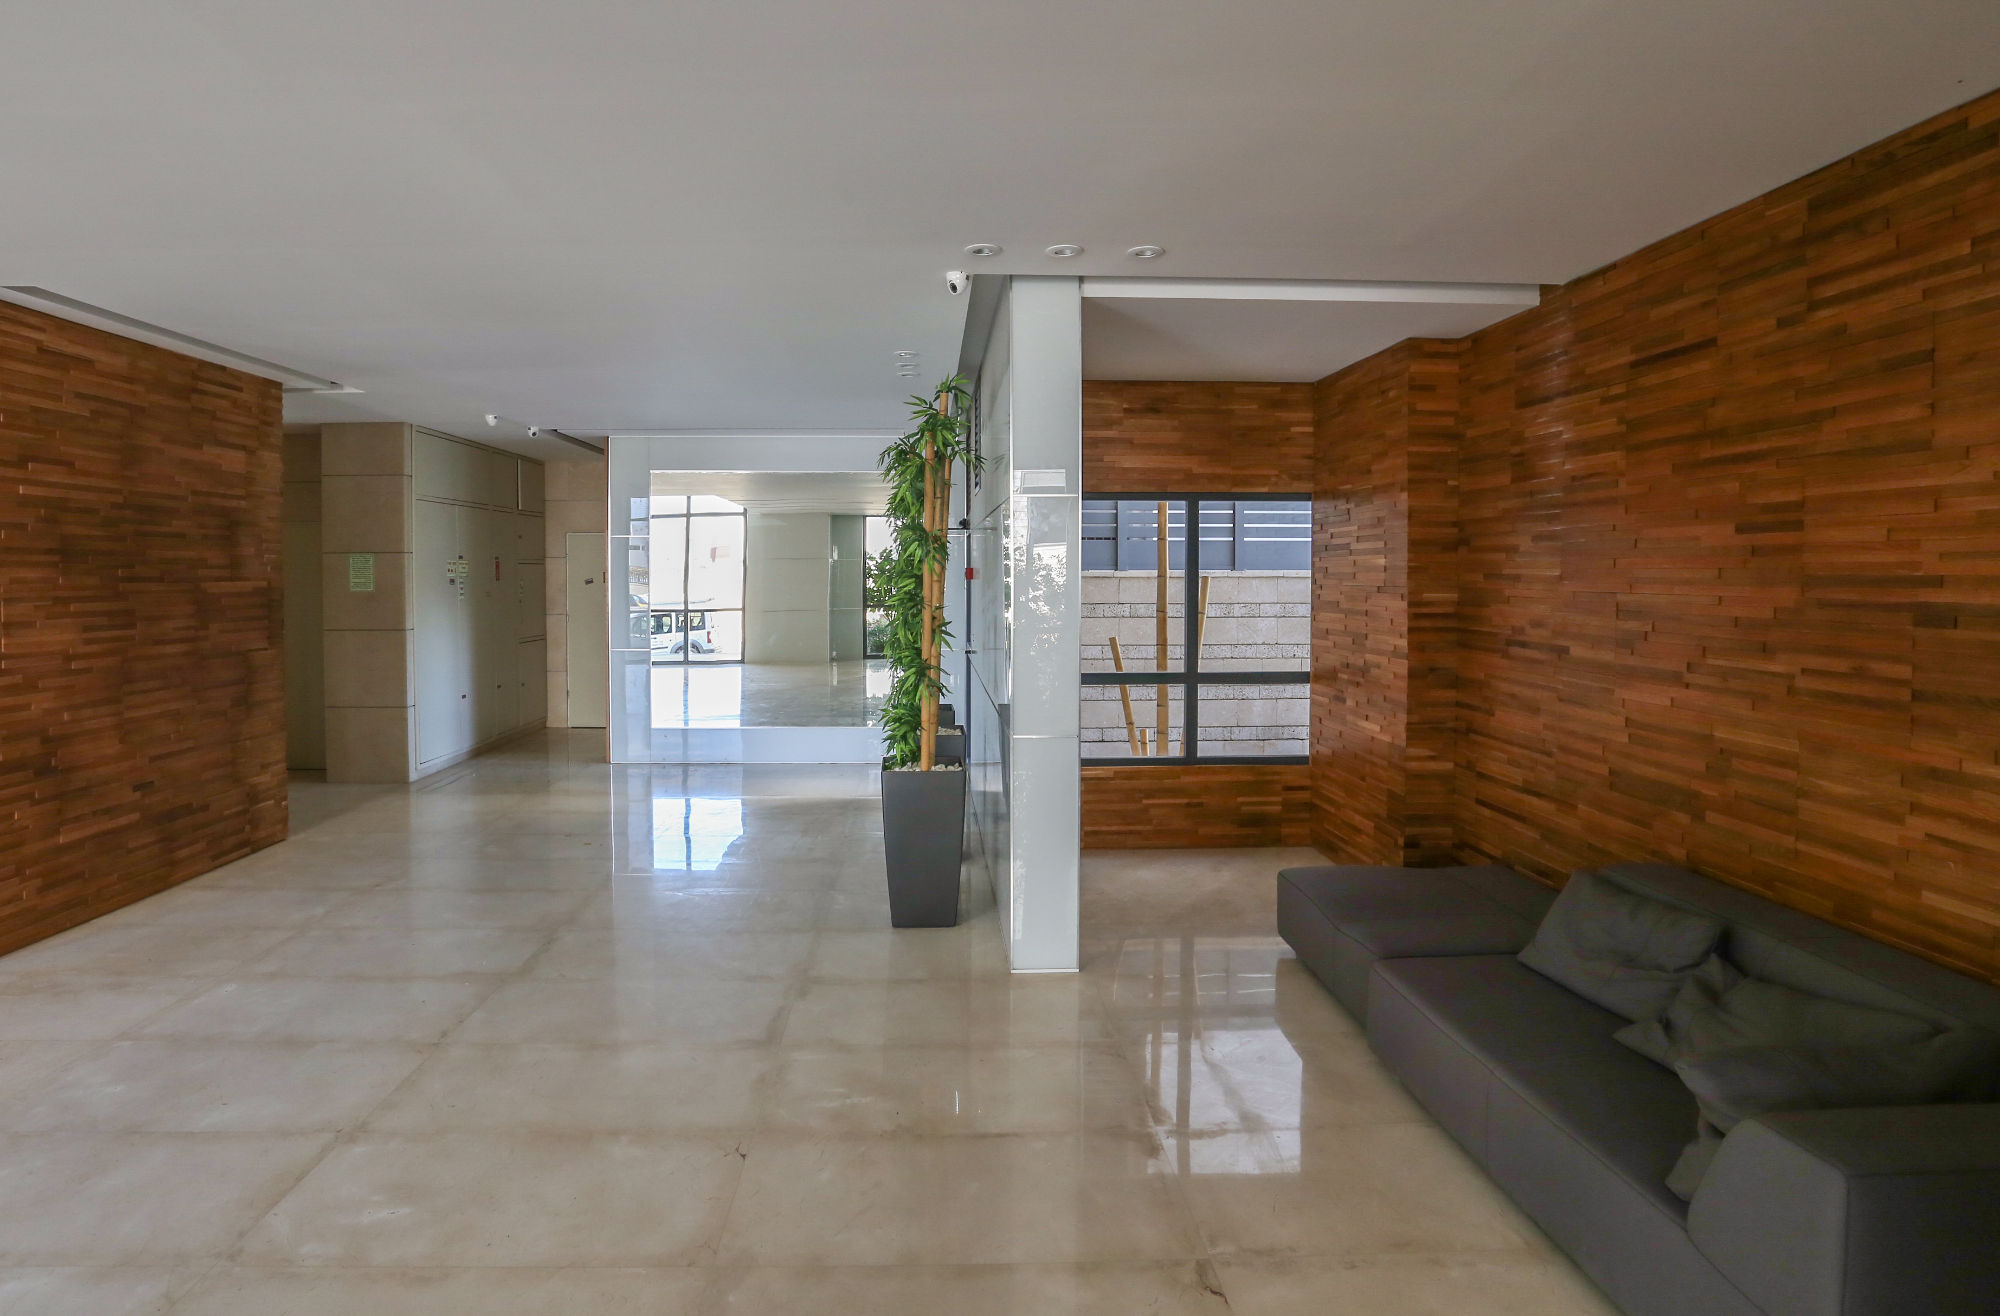 y7 דירות חדשות לאכלוס מיידי עם לובי מפואר